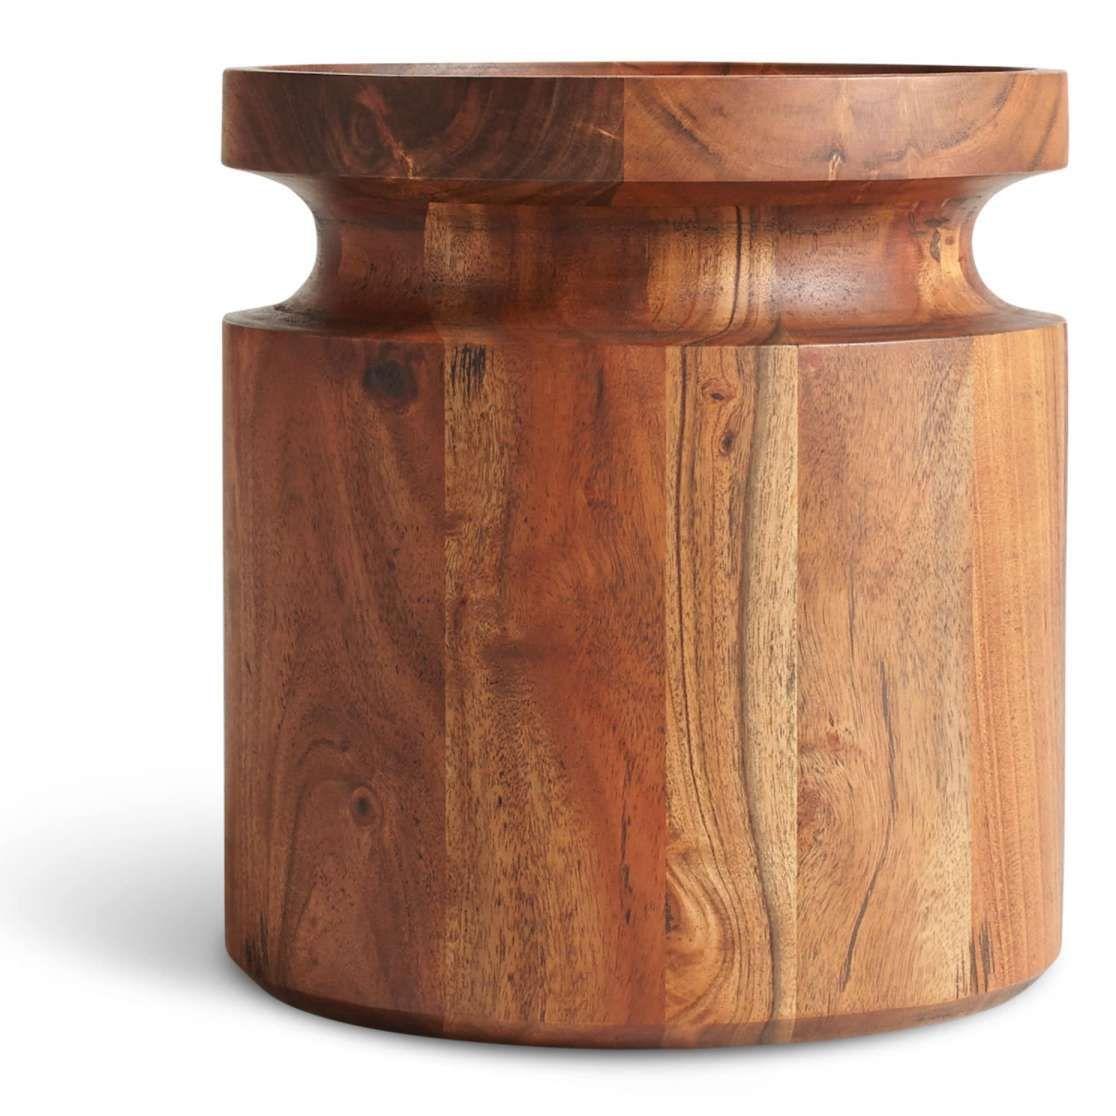 9 Fancy Acacia Wood Side Table Gallery Side Table Wood Solid Wood Side Table Side Table